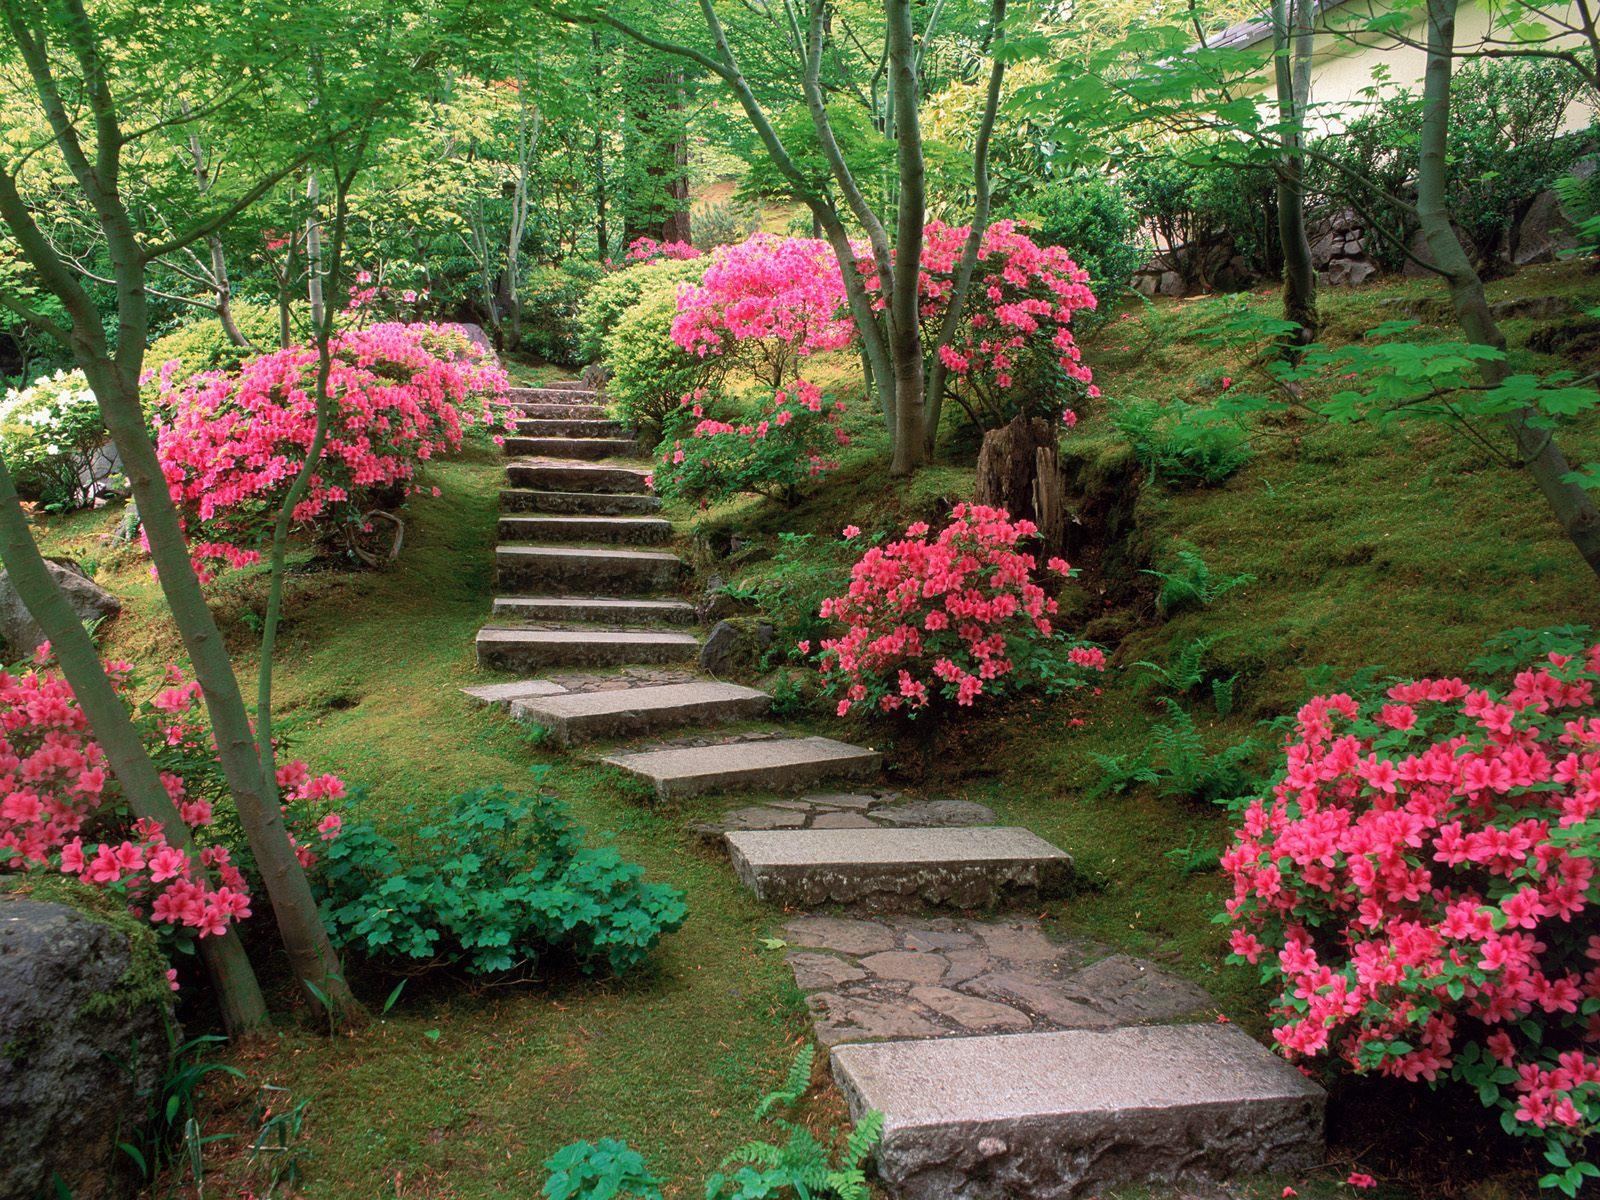 antiguos jardines tradiciones jardines japoneses - Jardines Japoneses